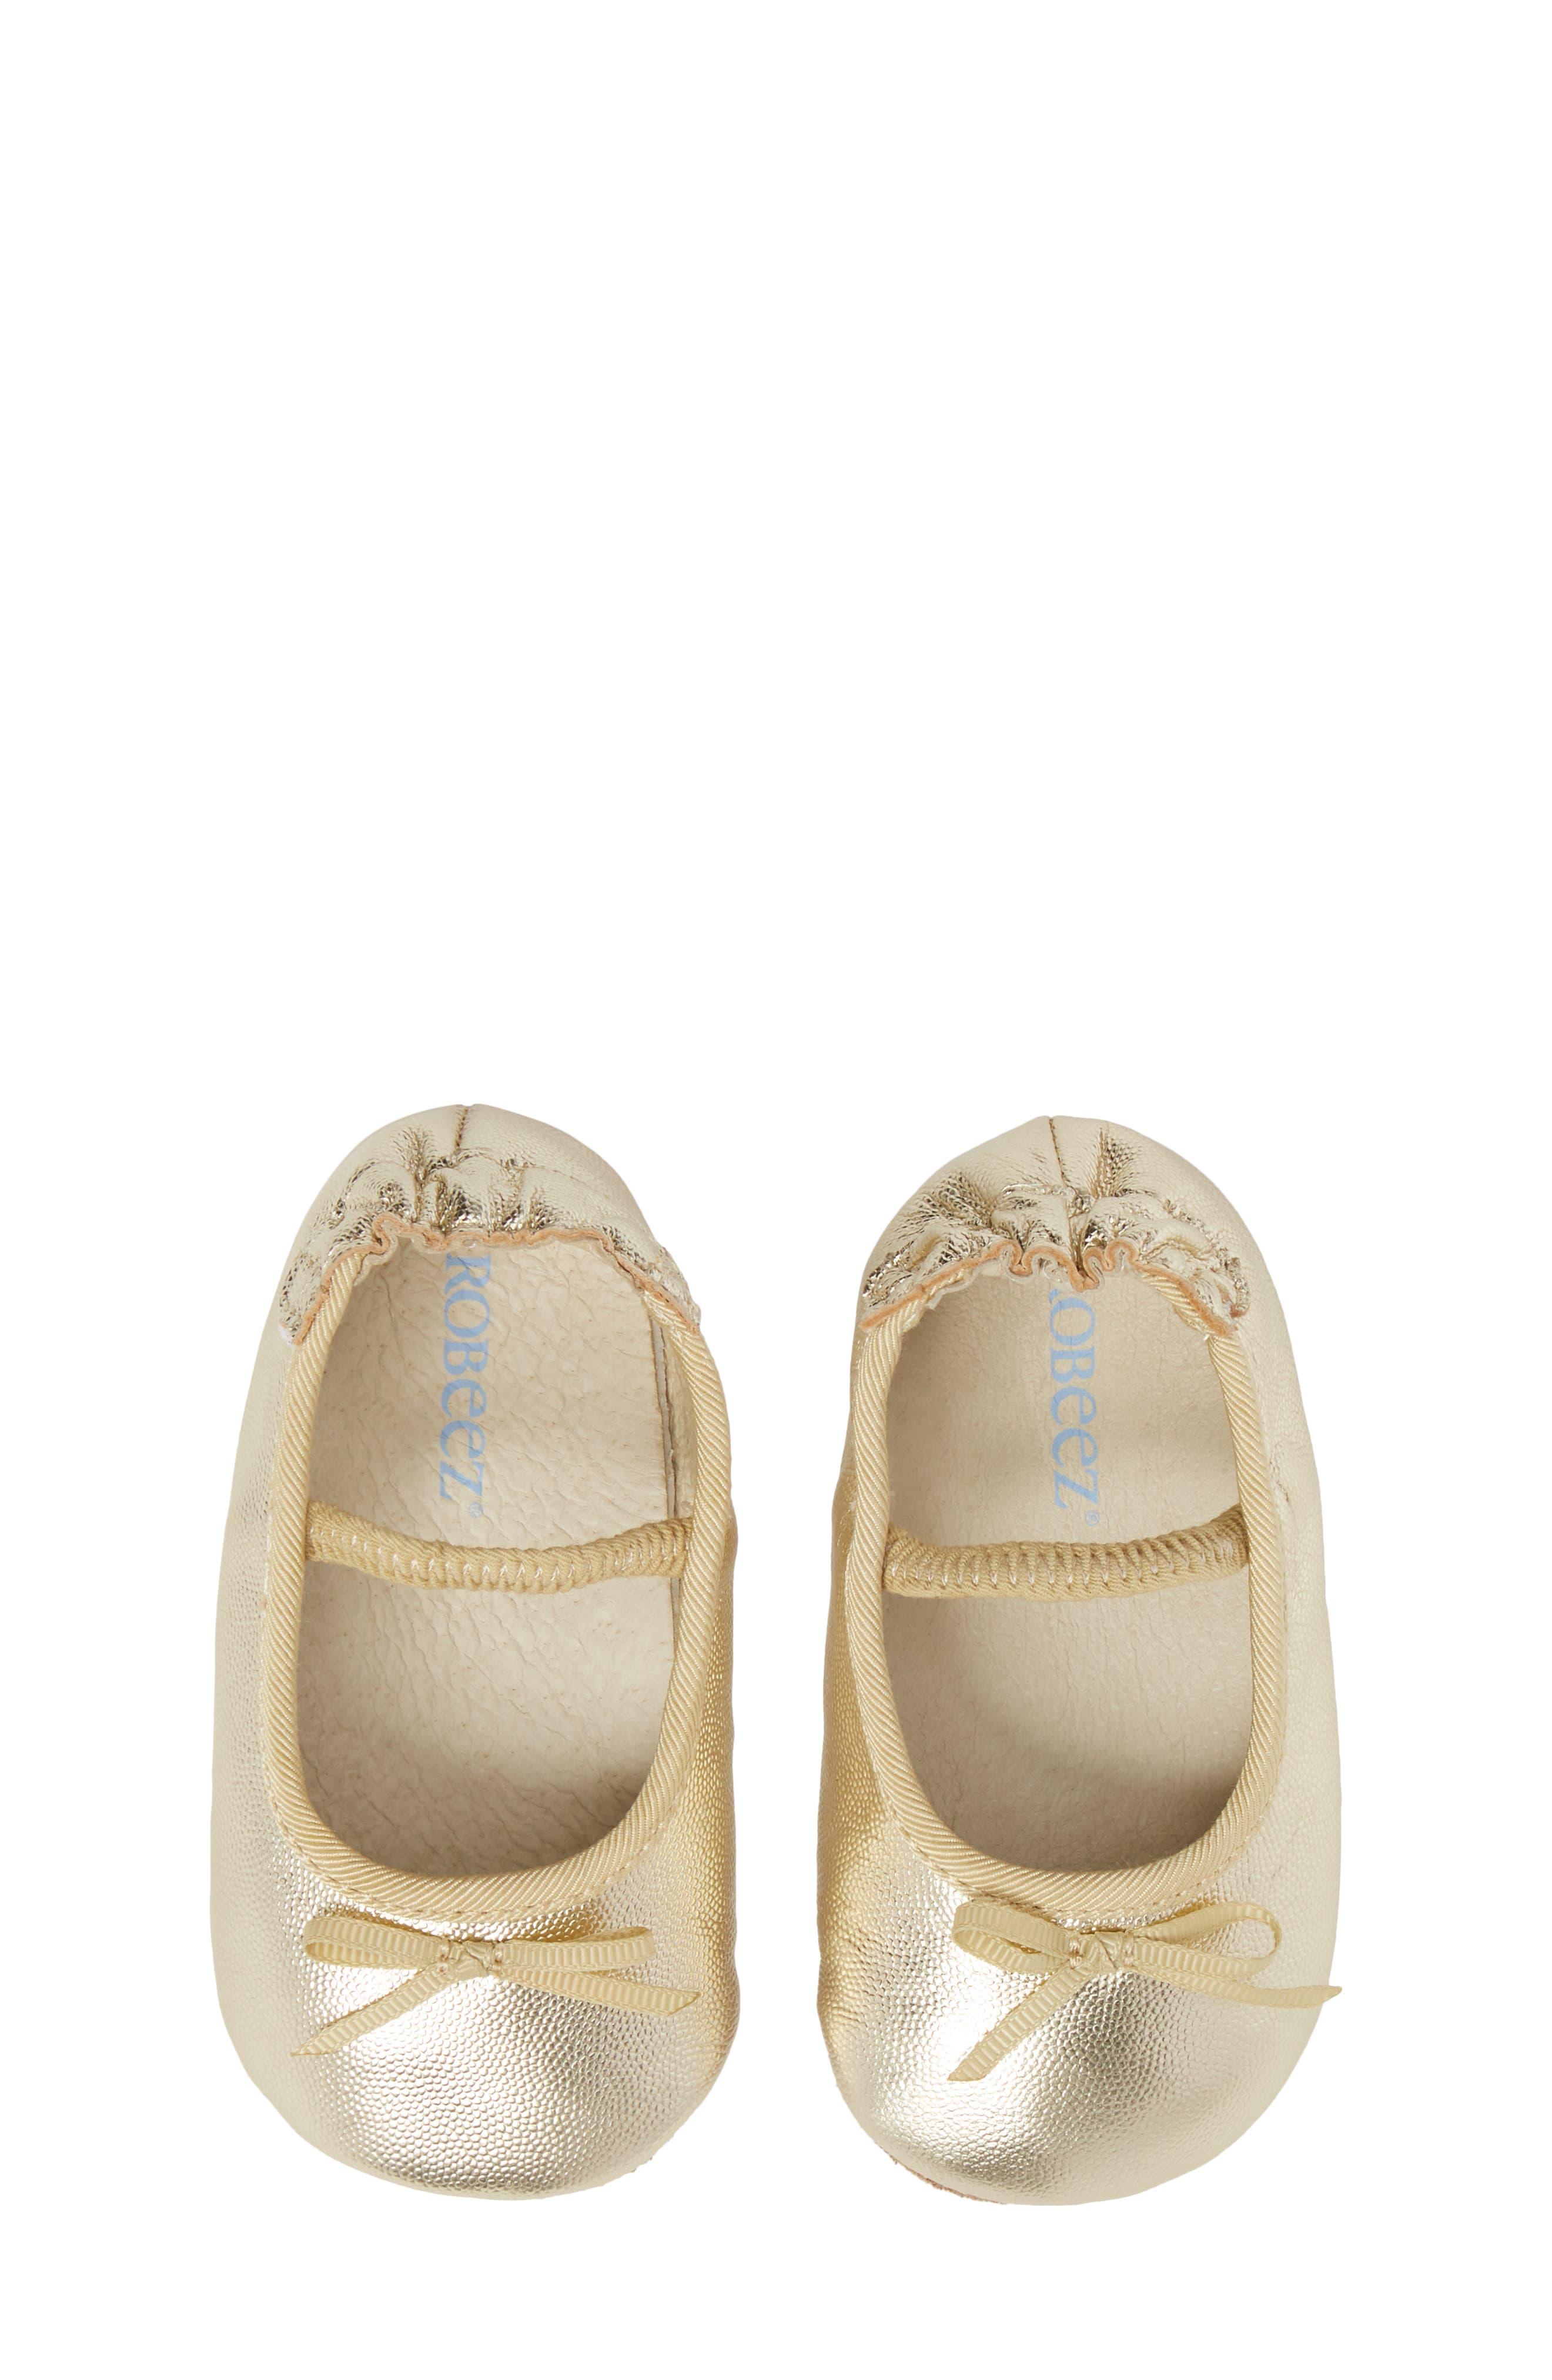 ROBEEZ<SUP>®</SUP>, Athena Ballet Strap Crib Shoe, Alternate thumbnail 5, color, GOLD